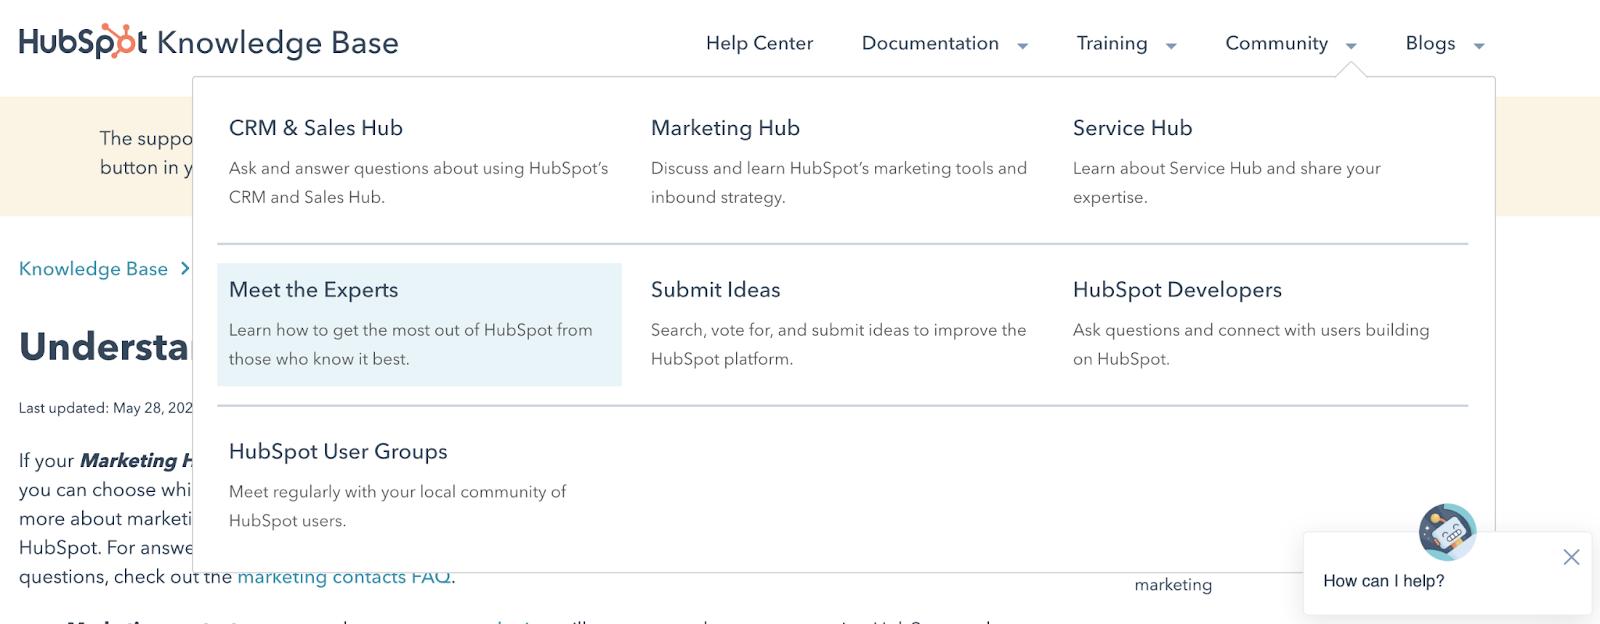 HubSpot knowledge base dashboard view